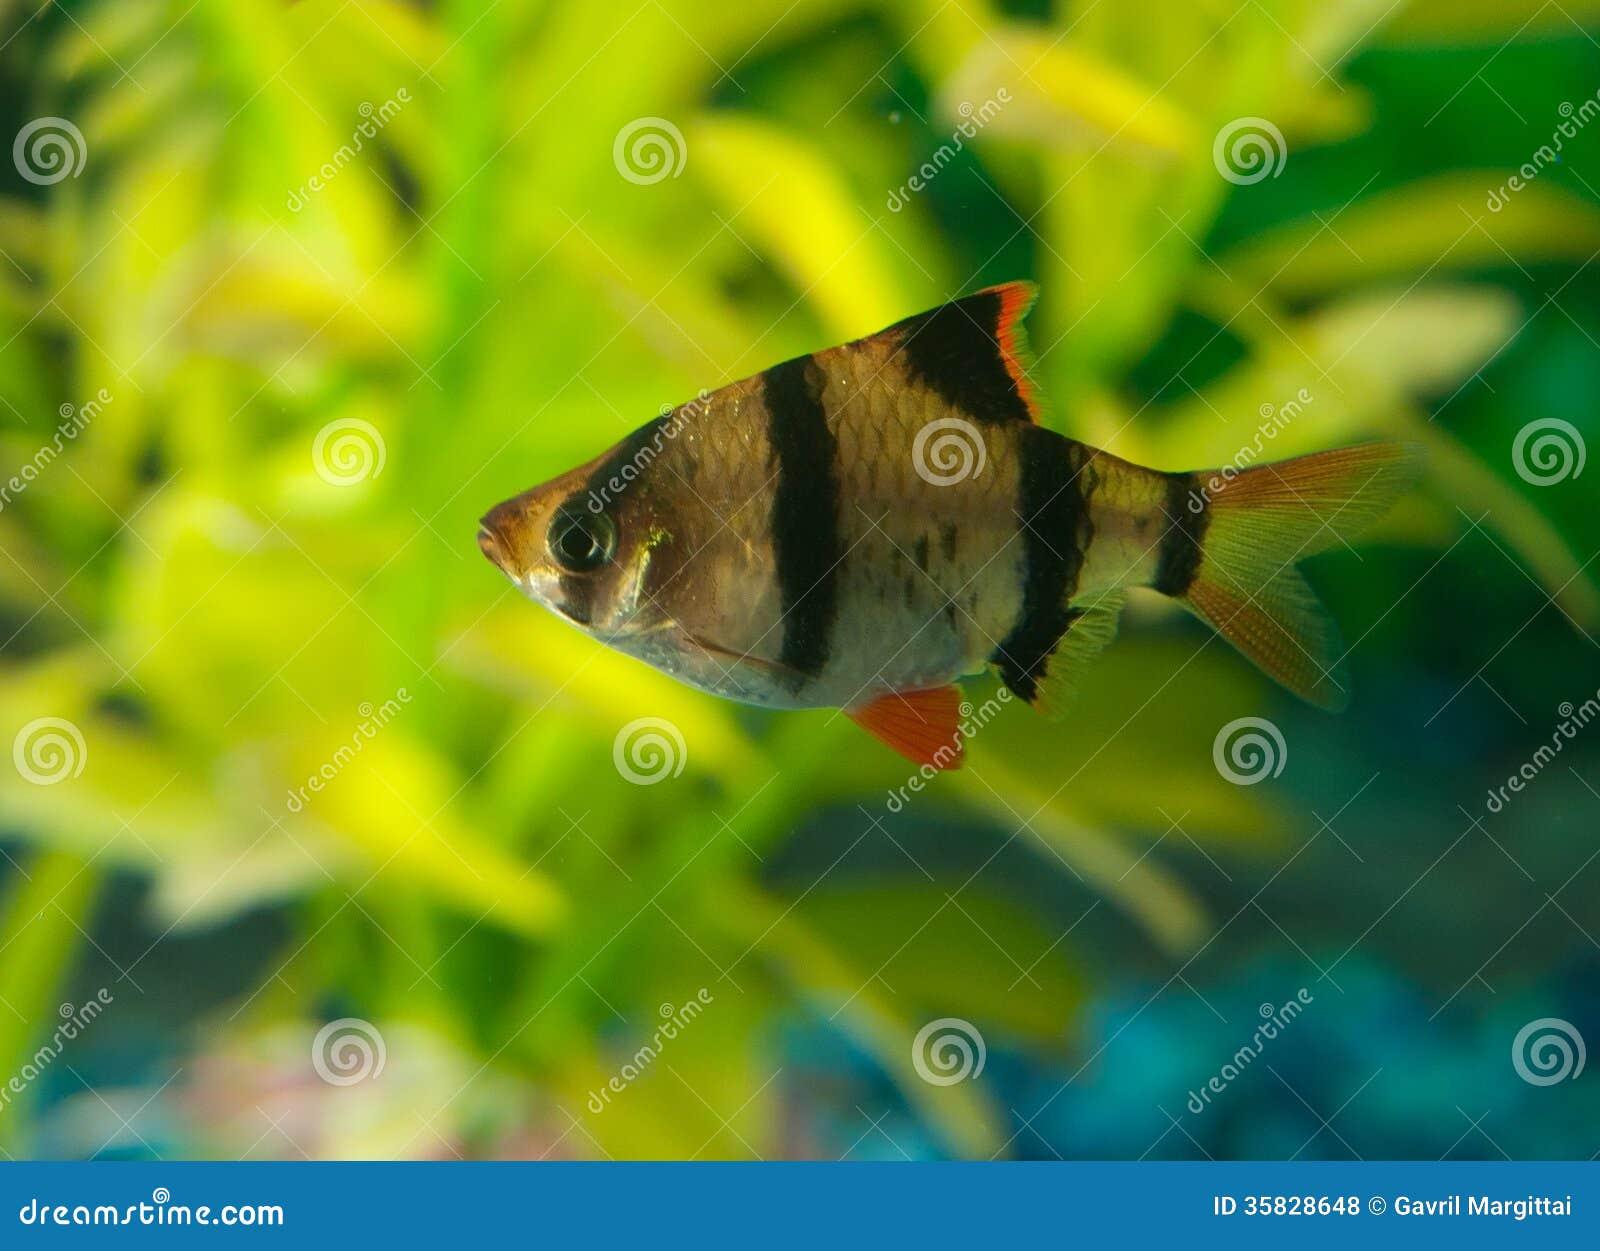 Zebra tetra fish royalty free stock photos image 35828648 for Small pet fish